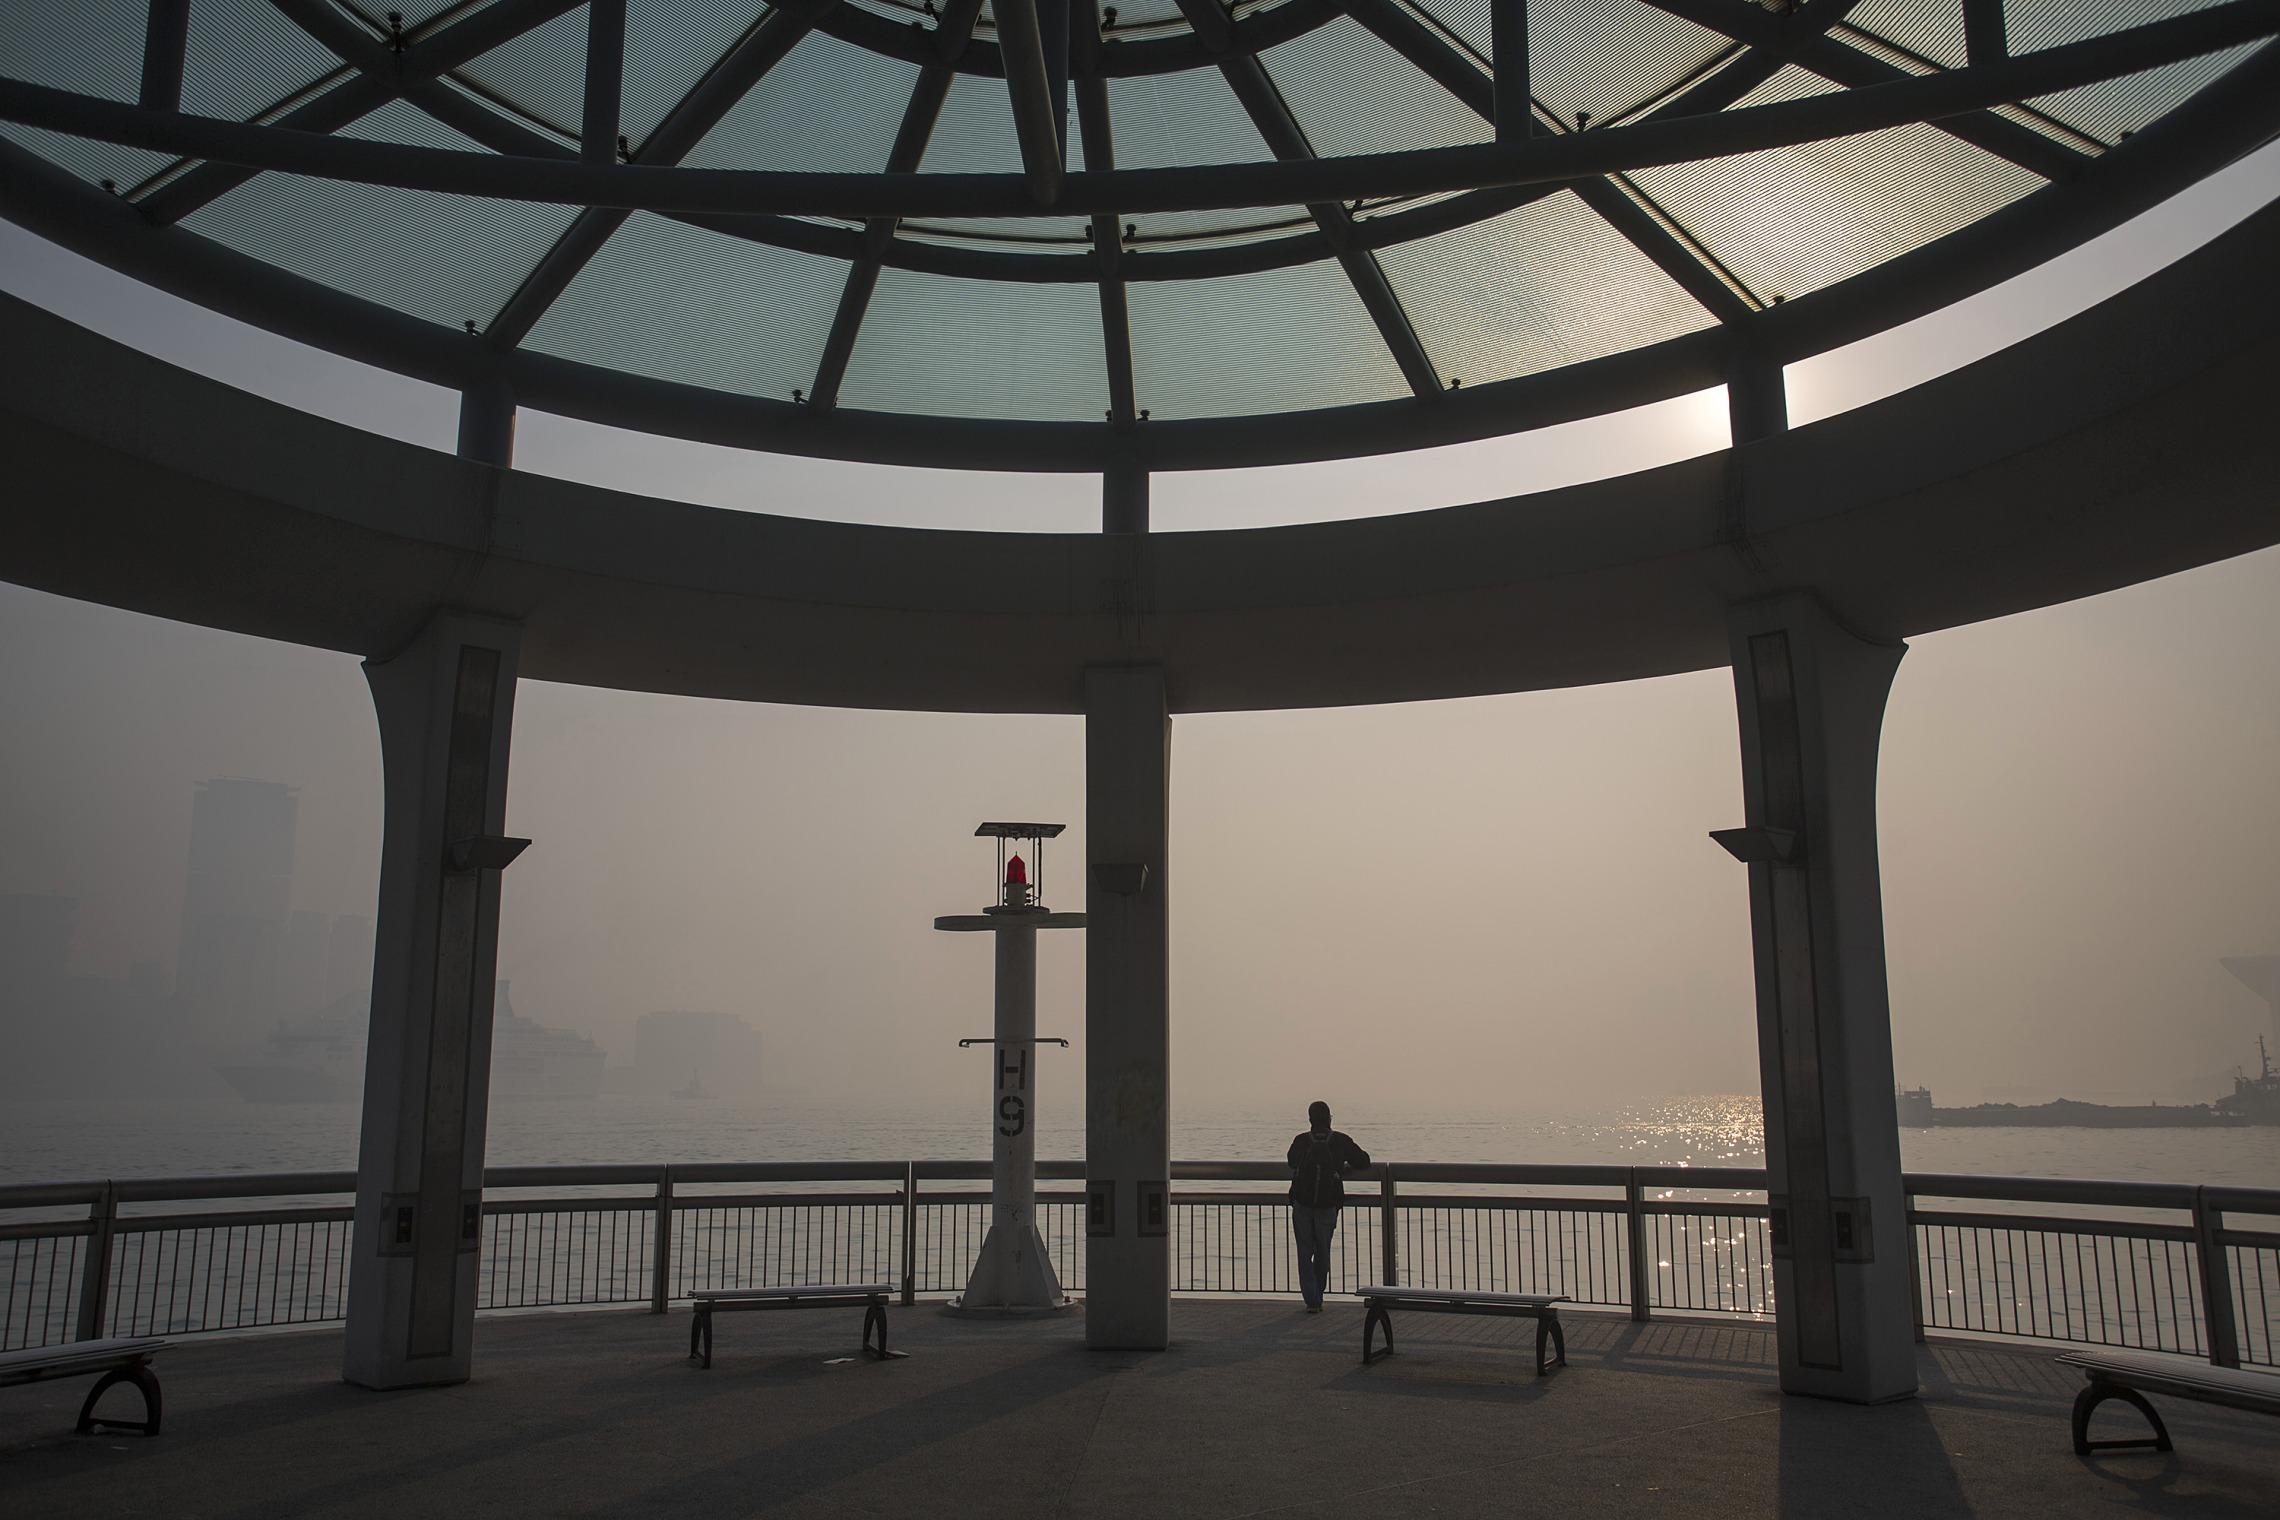 Hong Kong Banks Cast Pall Over Property by Raising Rates - Bloomberg